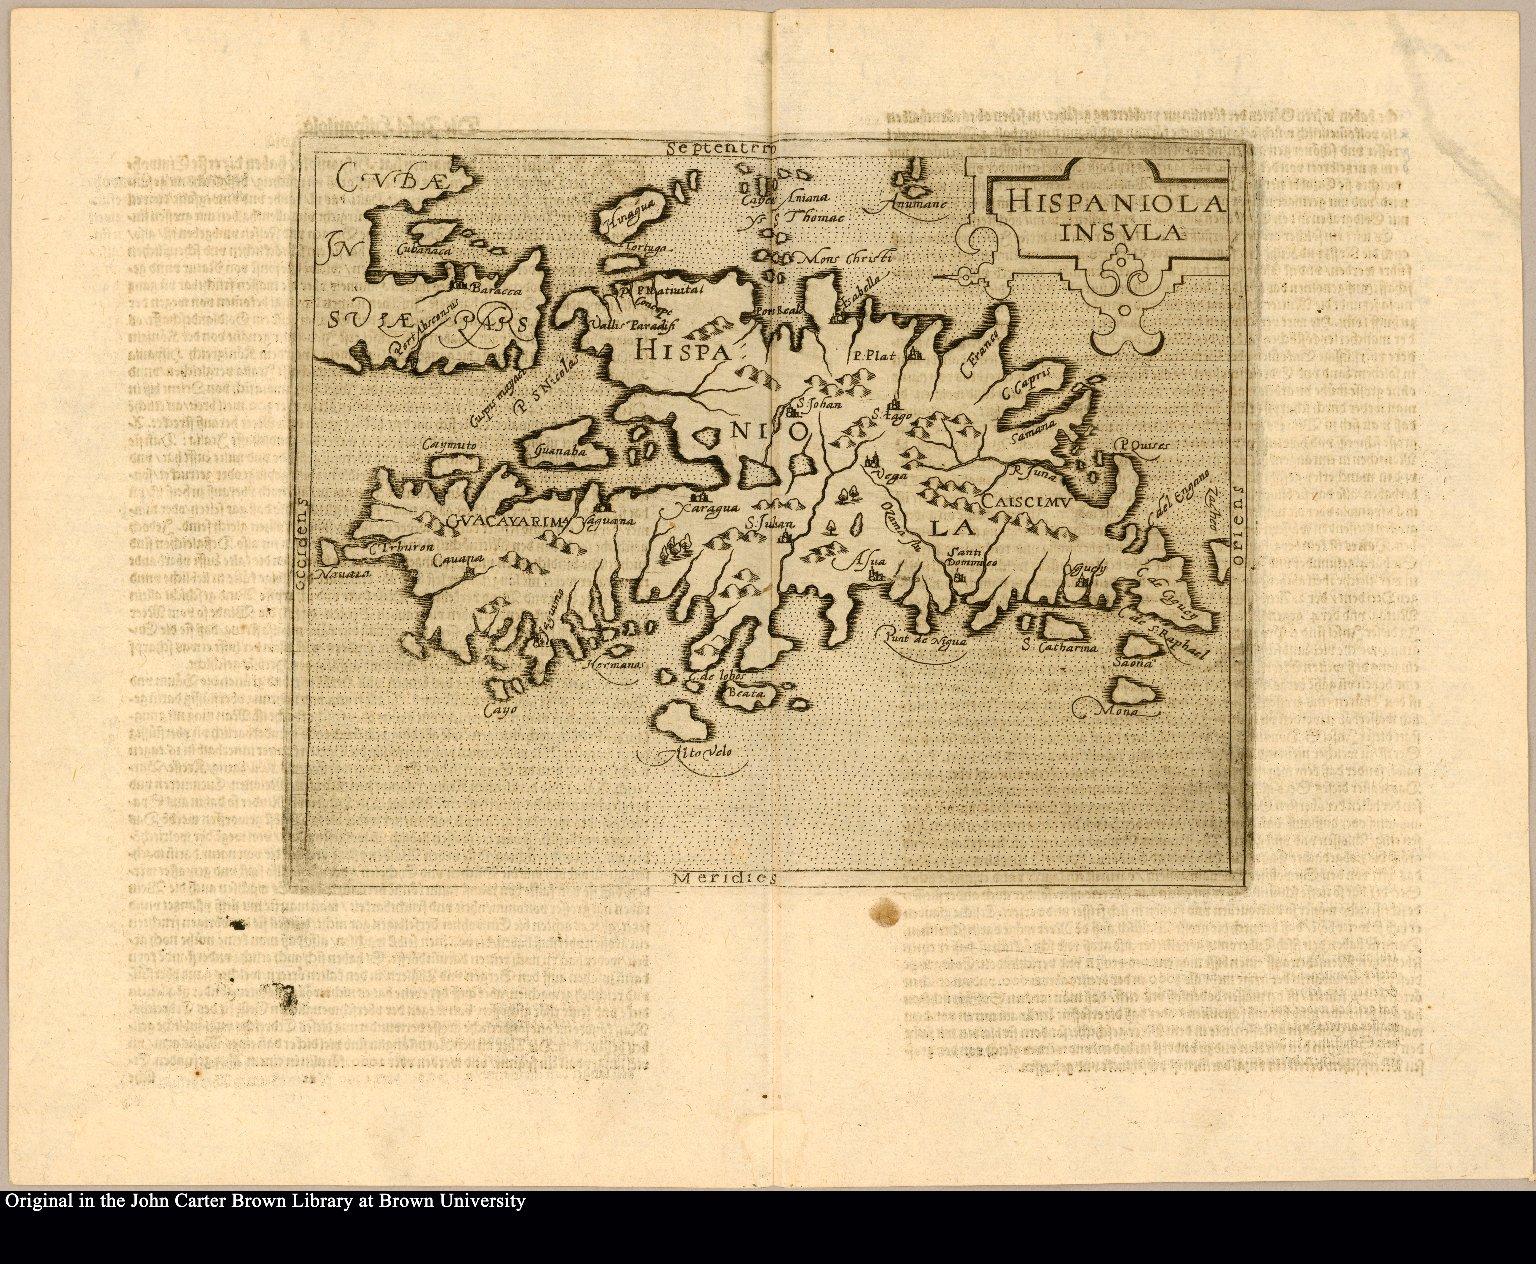 Hispaniola insula